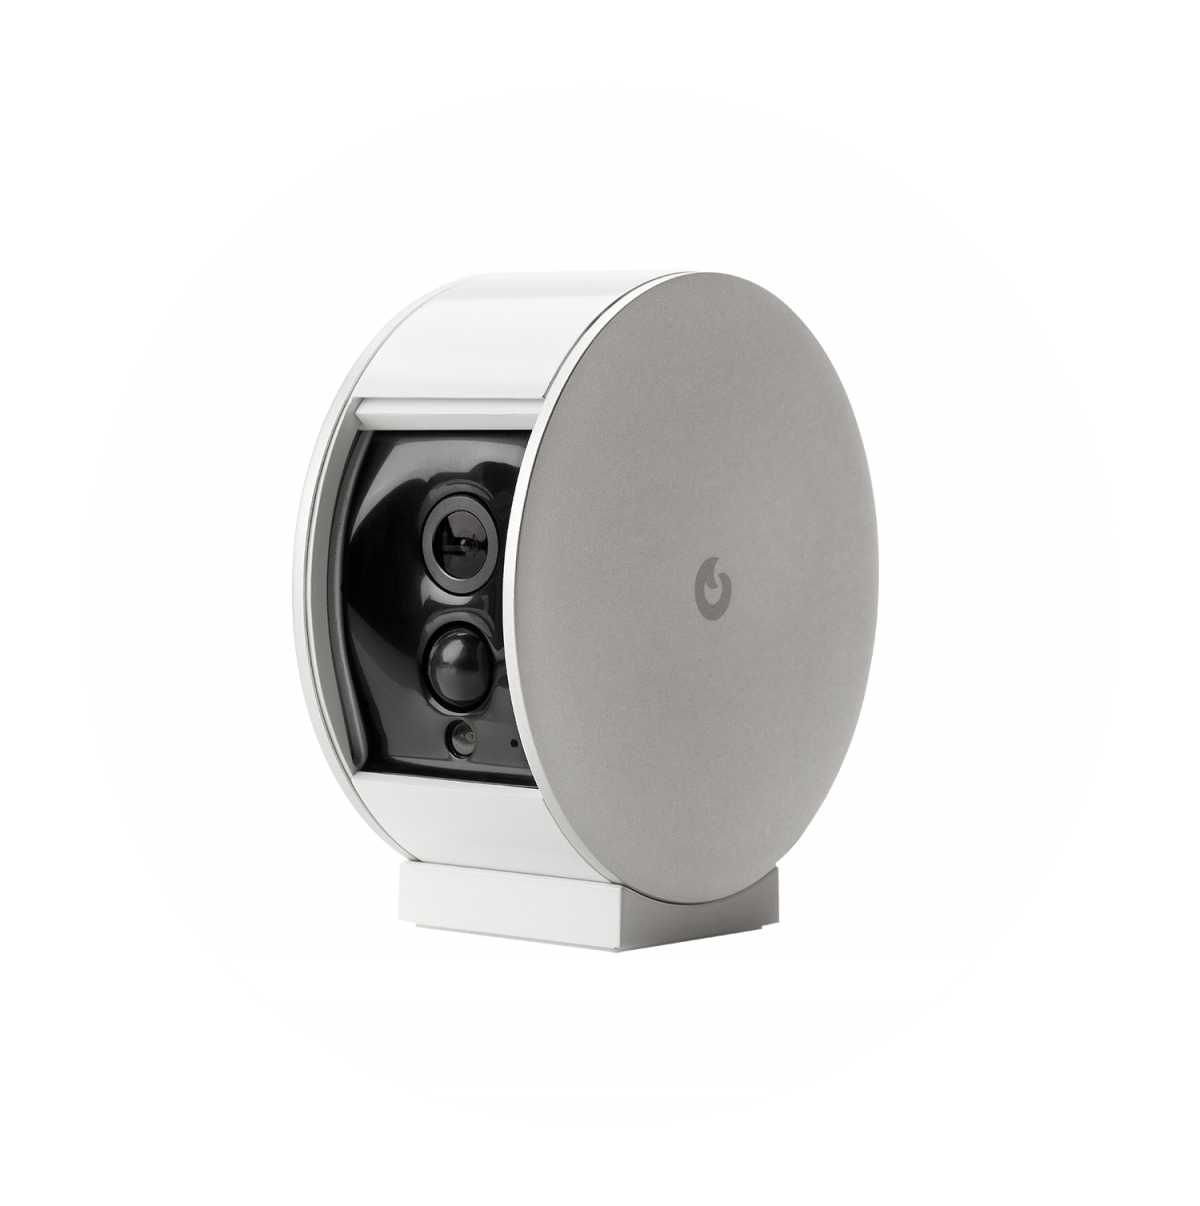 cam ra security myfox bestofrobots. Black Bedroom Furniture Sets. Home Design Ideas